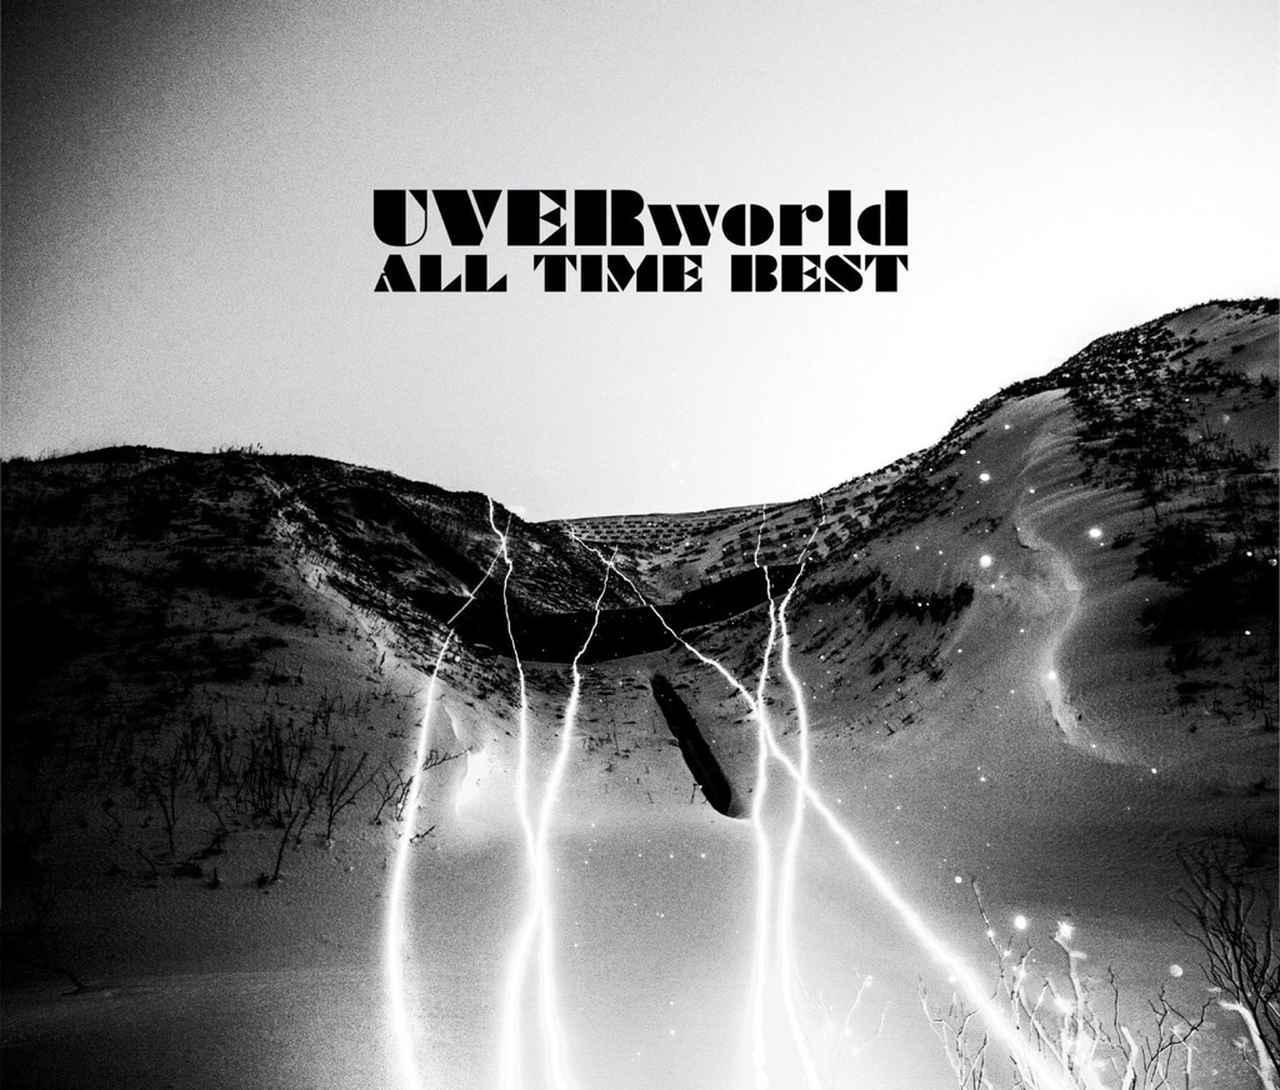 画像: ALL TIME BEST / UVERworld